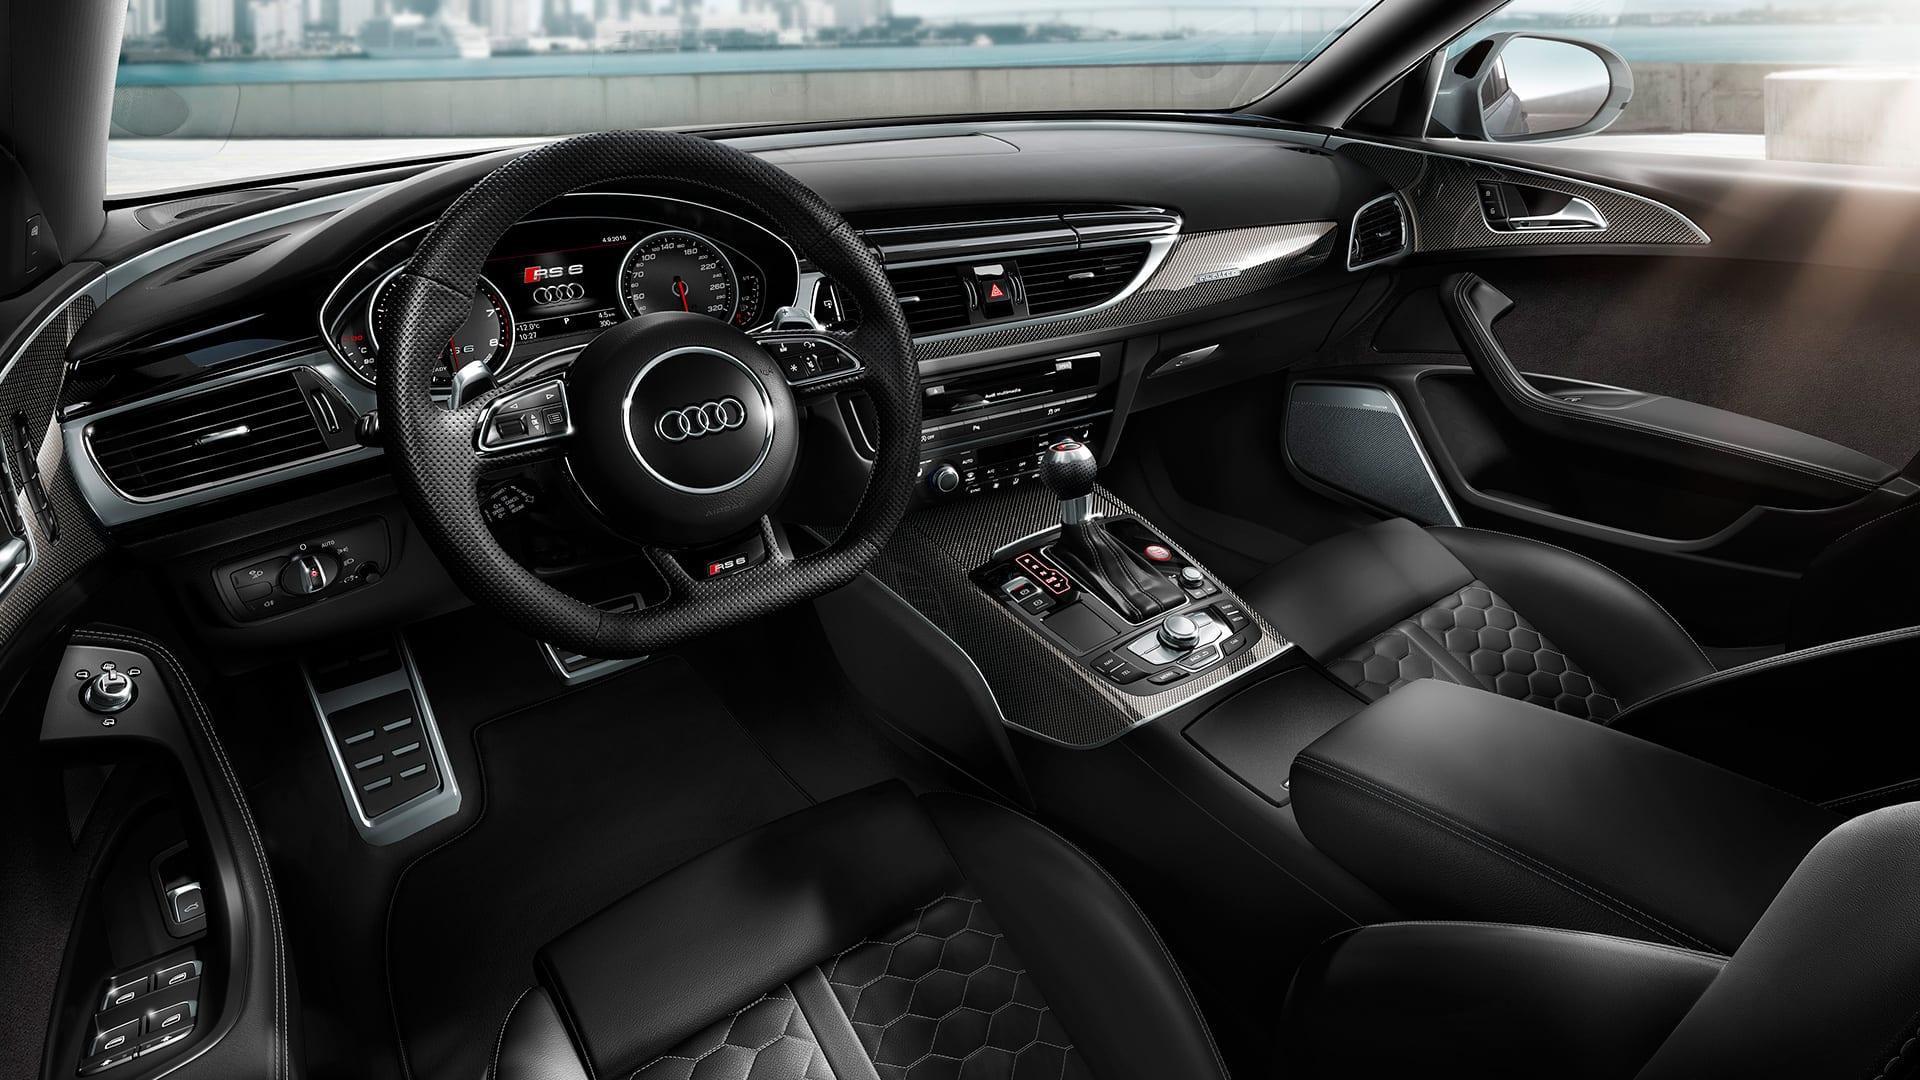 RS 6 Avant > A6 > Audi India